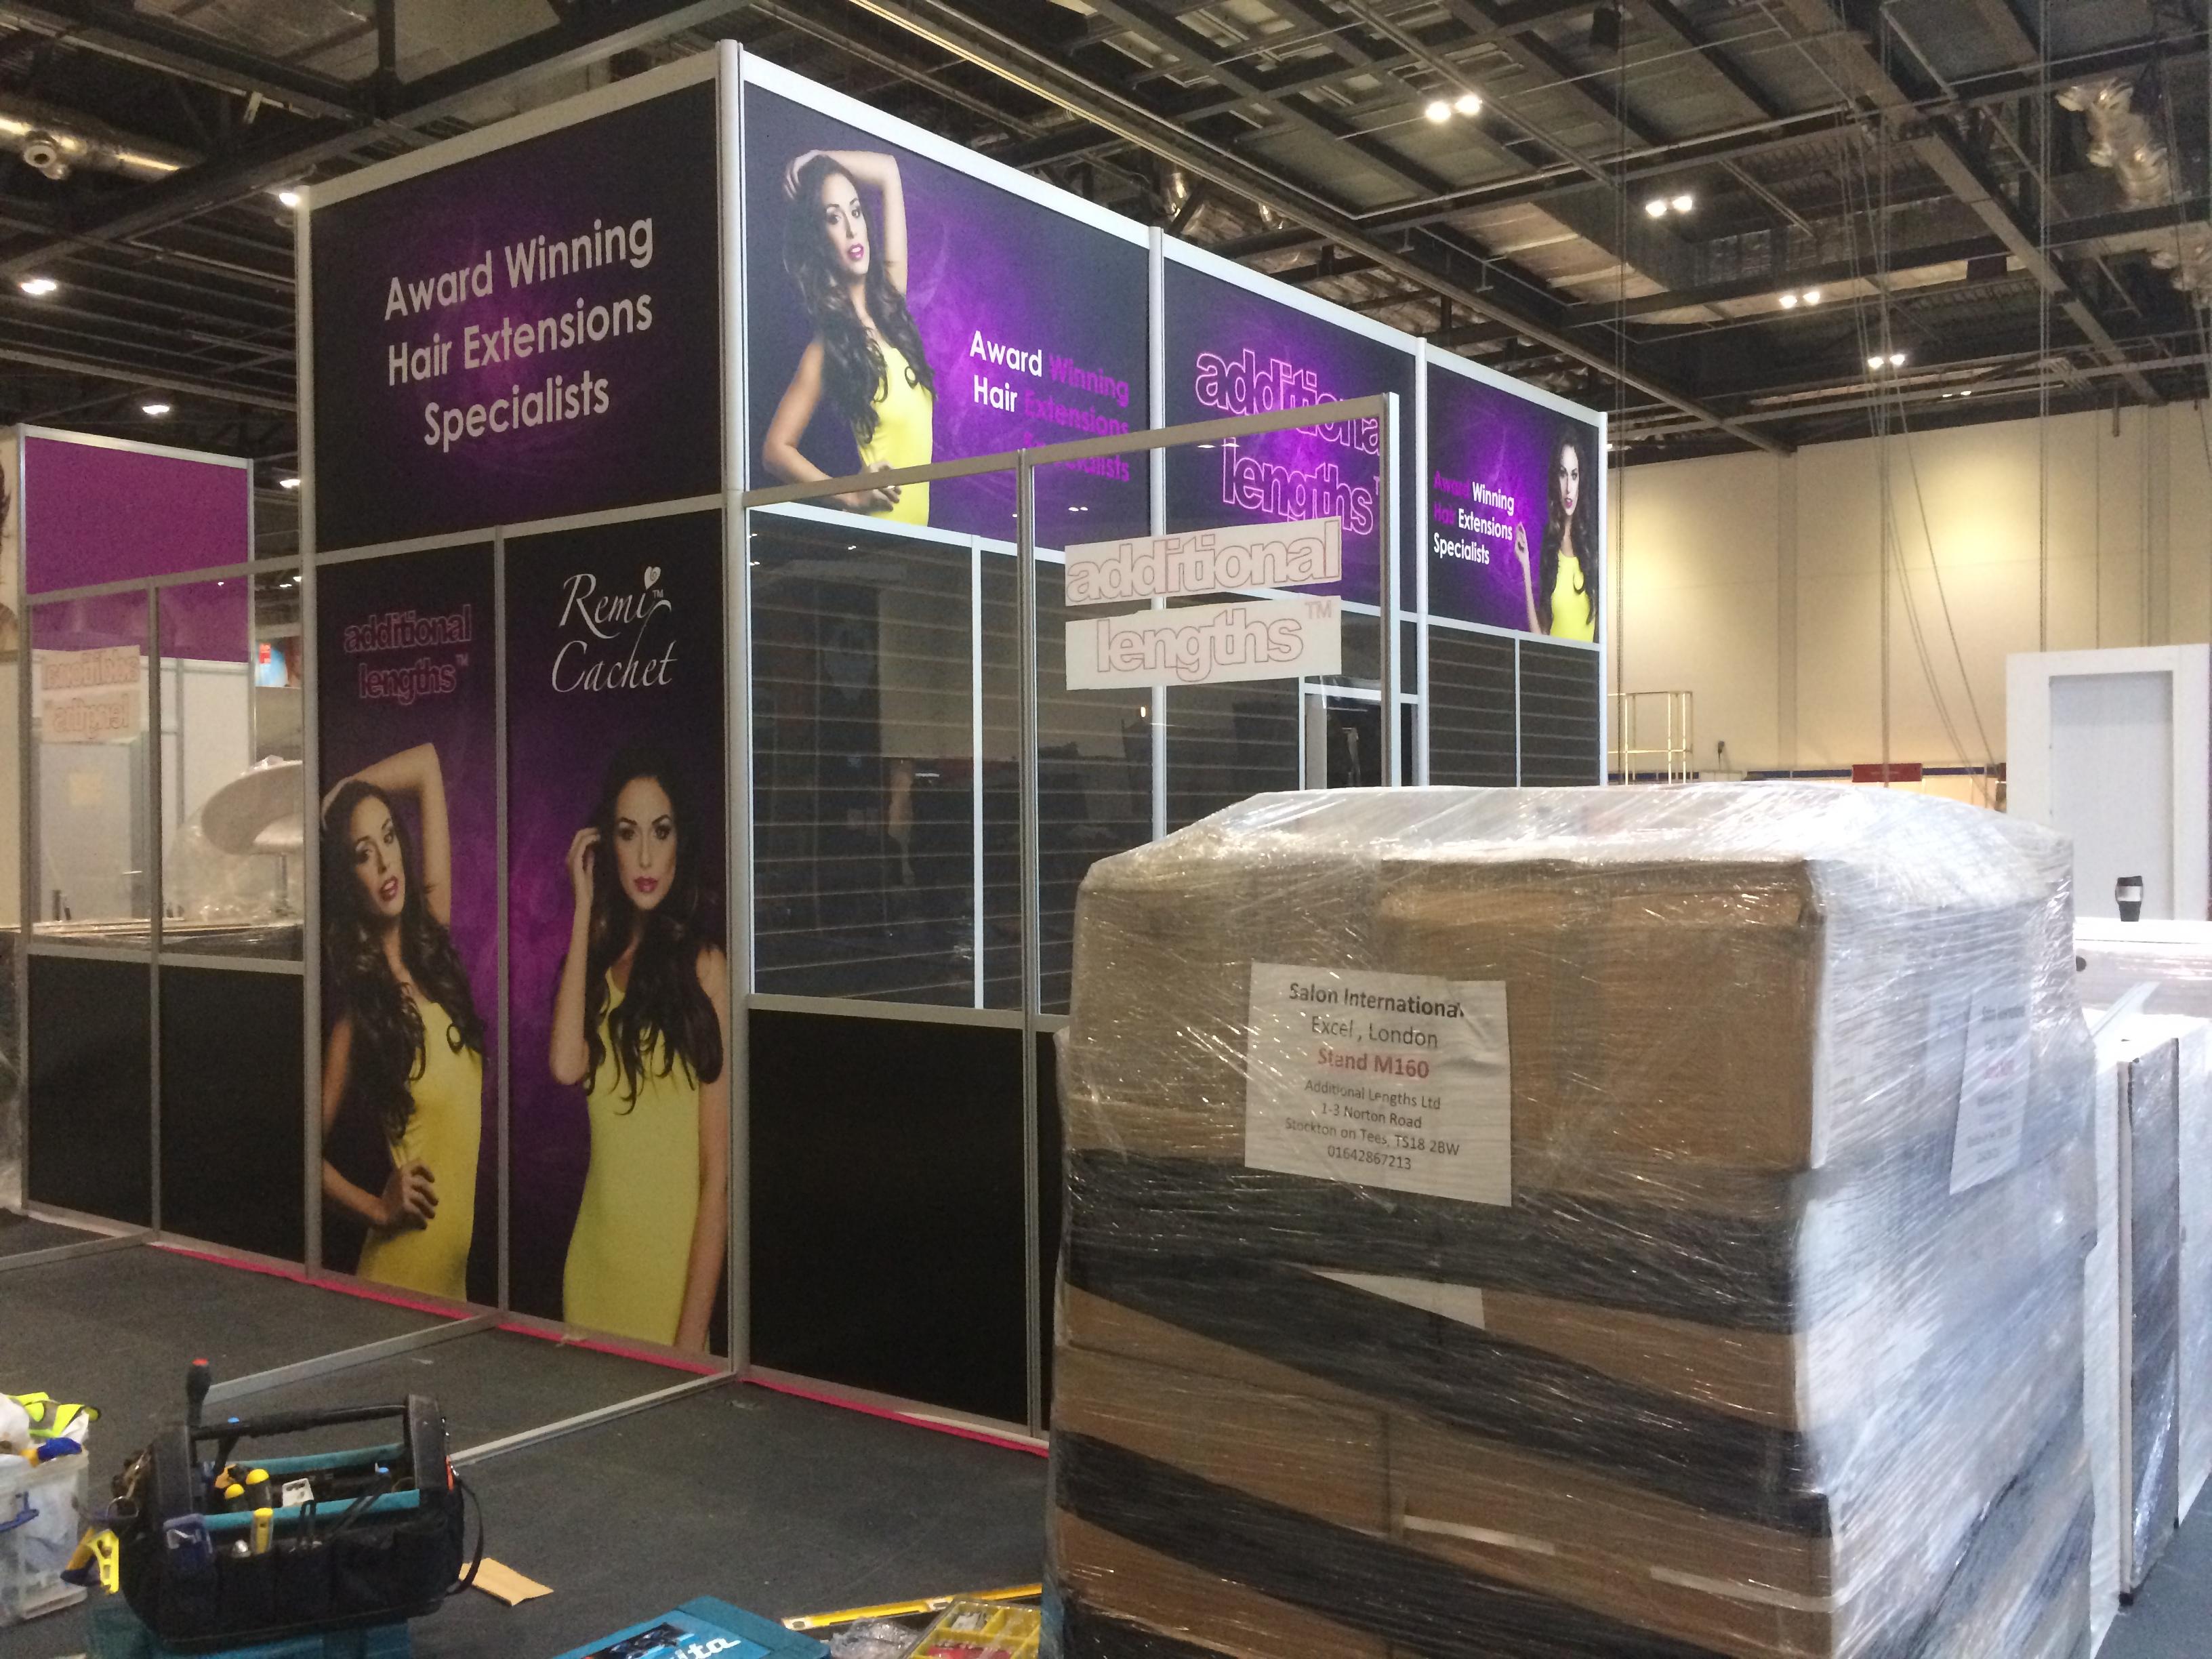 Exhibition Stand Logistics : Exhibition freighting logistics & event transport services ebiss uk